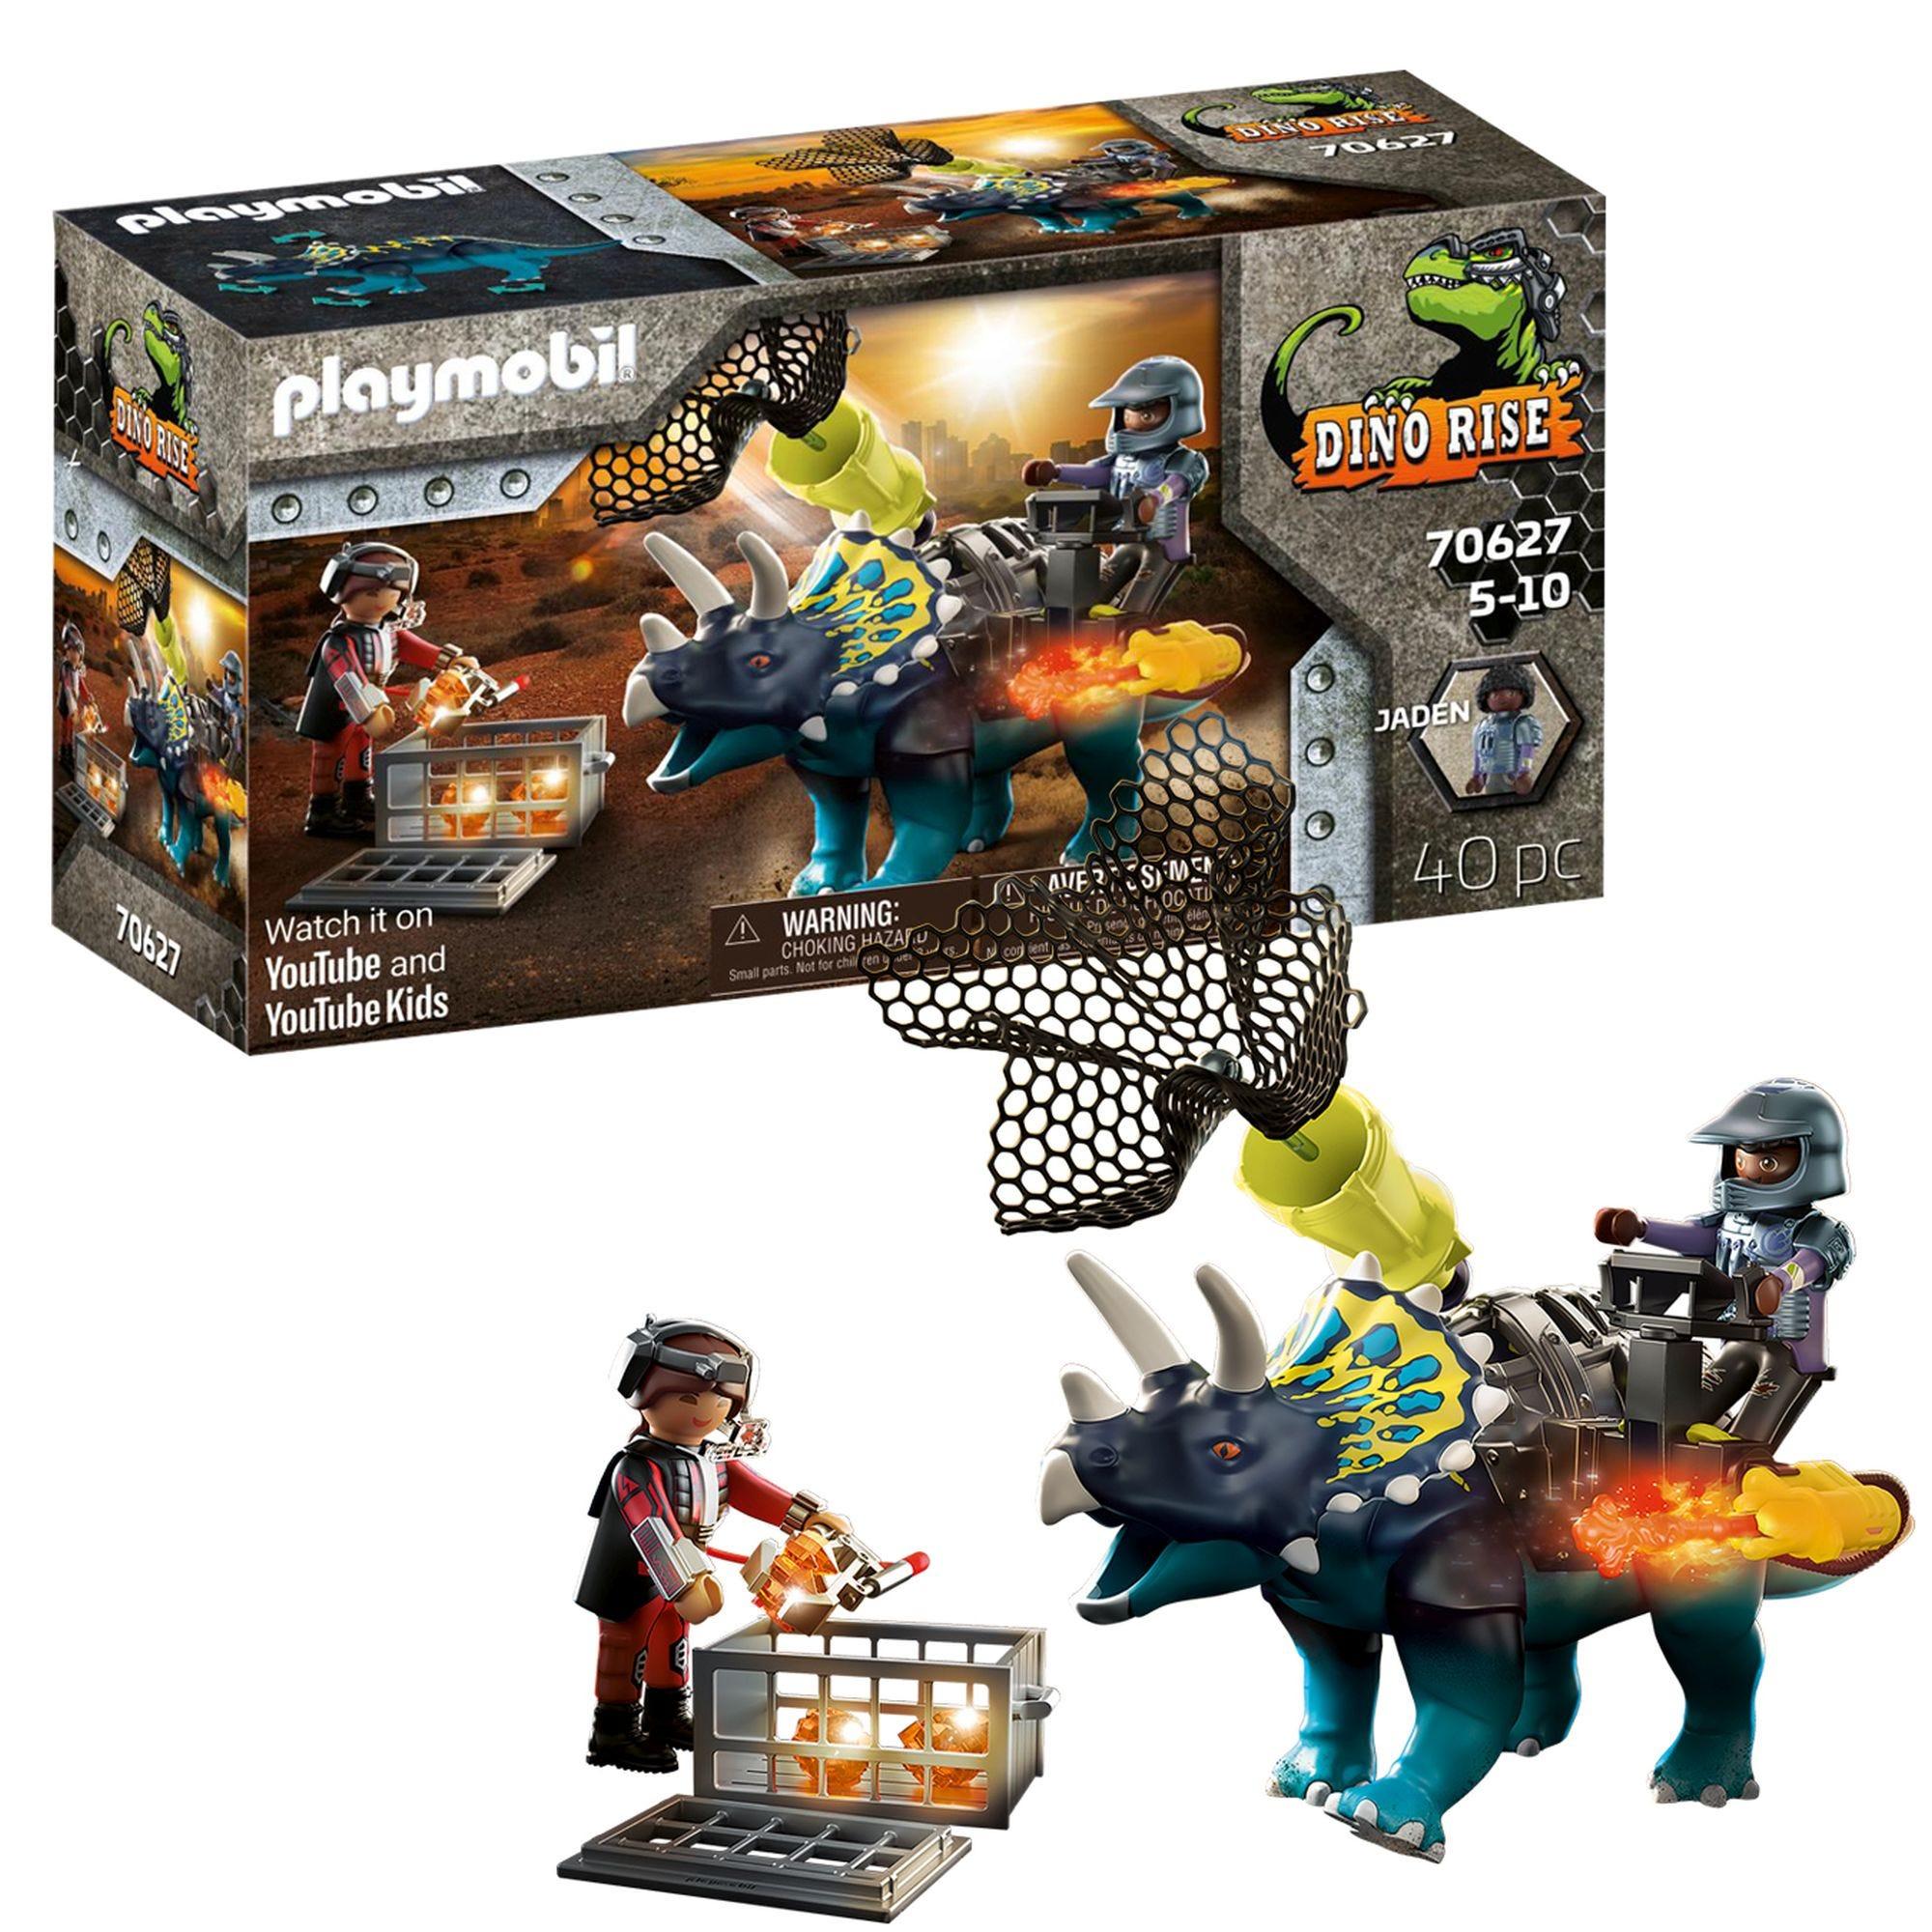 Playmobil 70627 Dinos Triceratops: Battle For The Legendary Stones